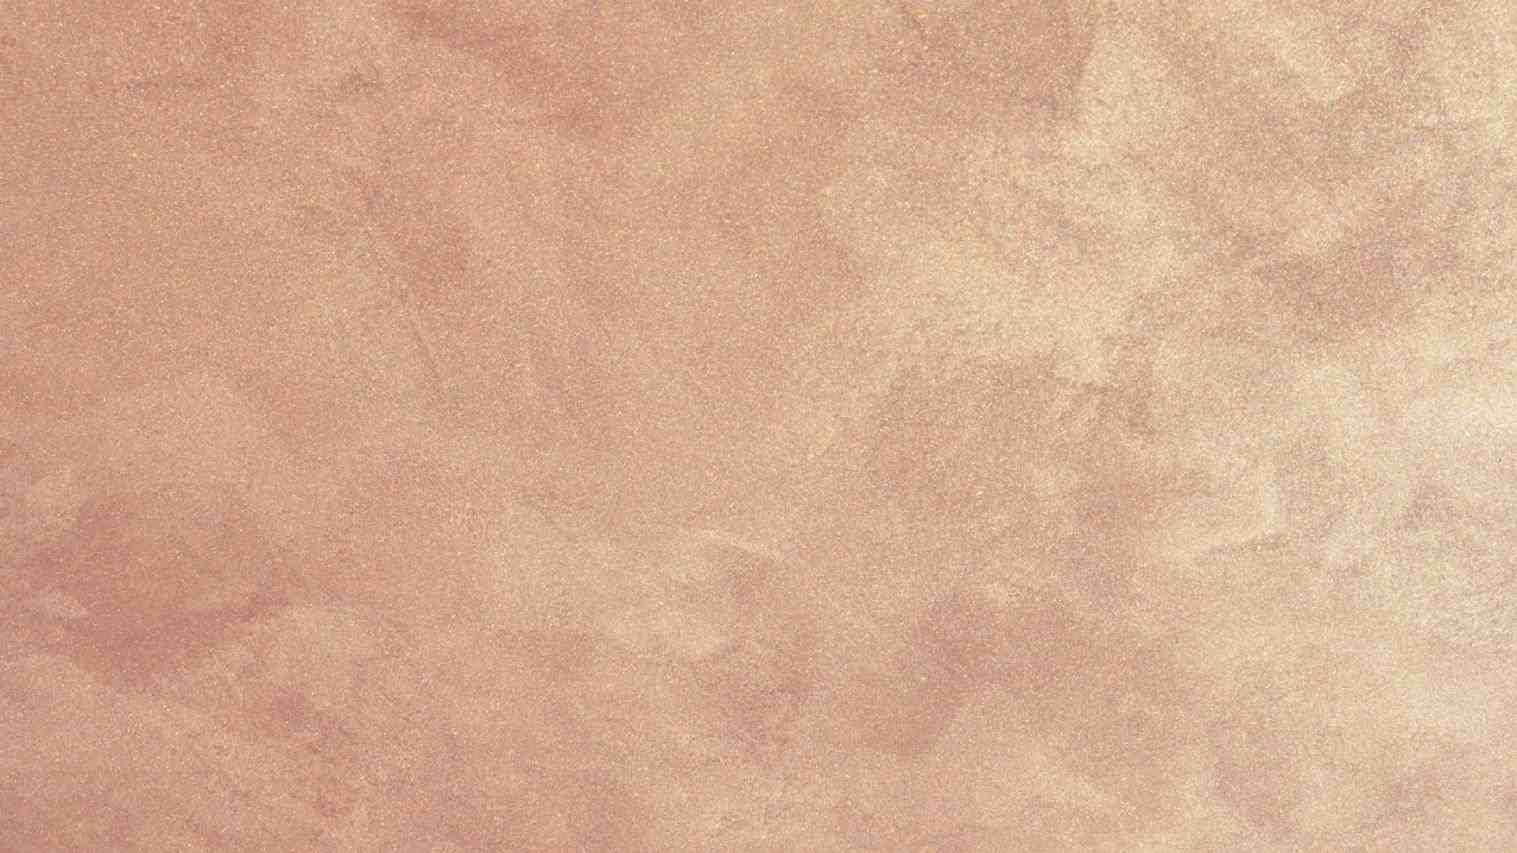 Brown Pastel Aesthetic Wallpapers Top Free Brown Pastel Aesthetic Backgrounds Wallpaperaccess